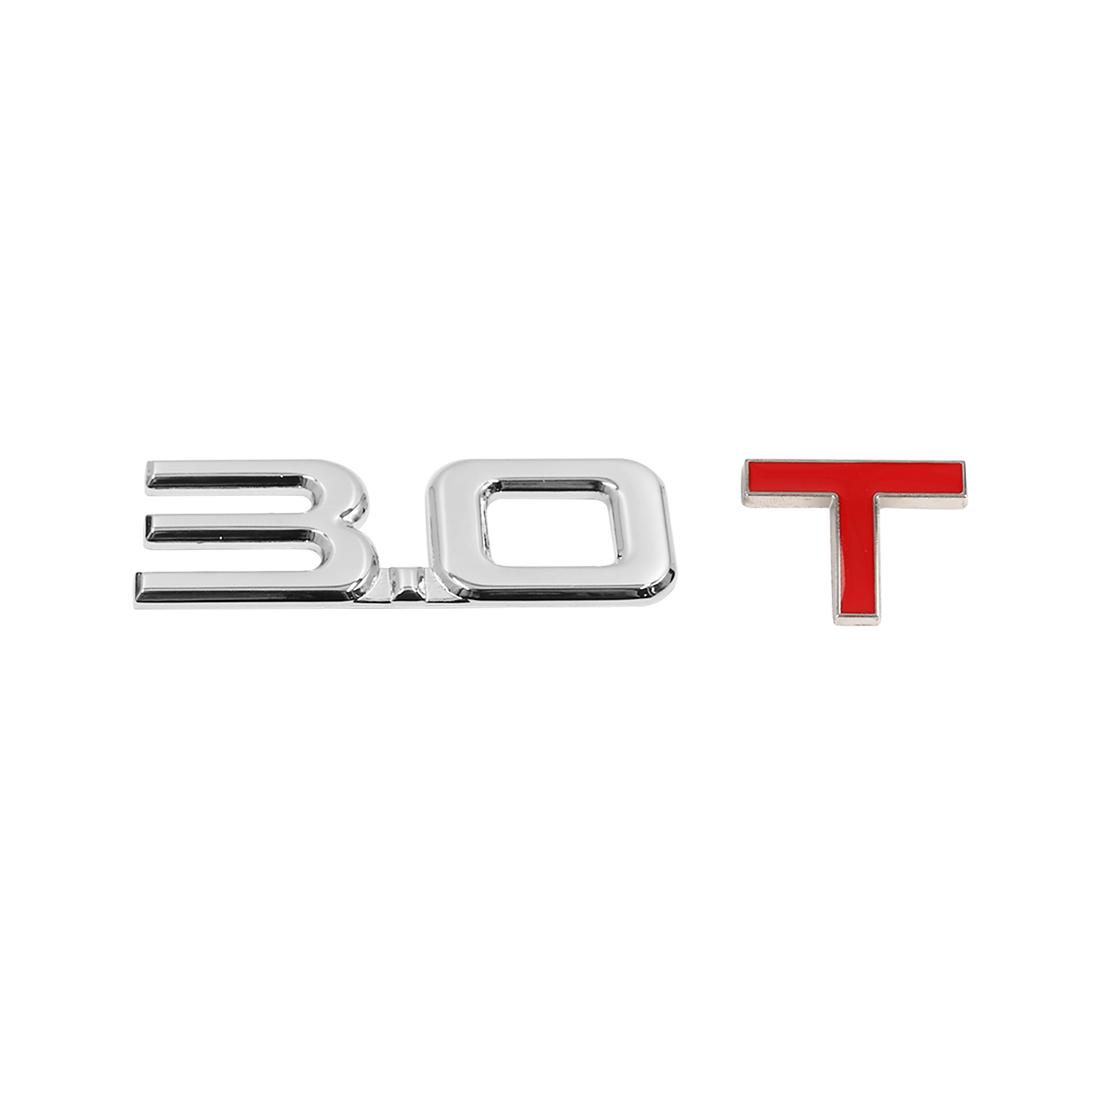 Universal 3D Metal 3.0T Shaped Car Decorative Emblem Badge Decal Sticker